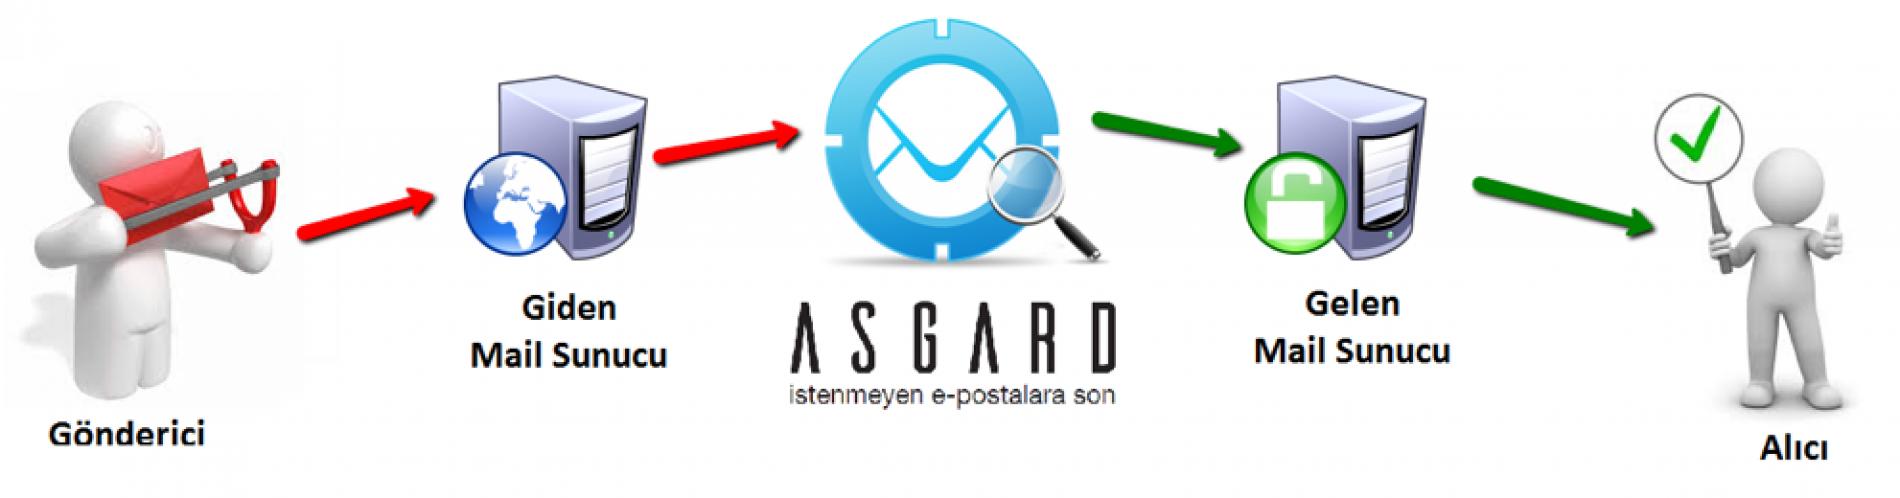 ASGARD ile İstenmeyen E-Postalara Son